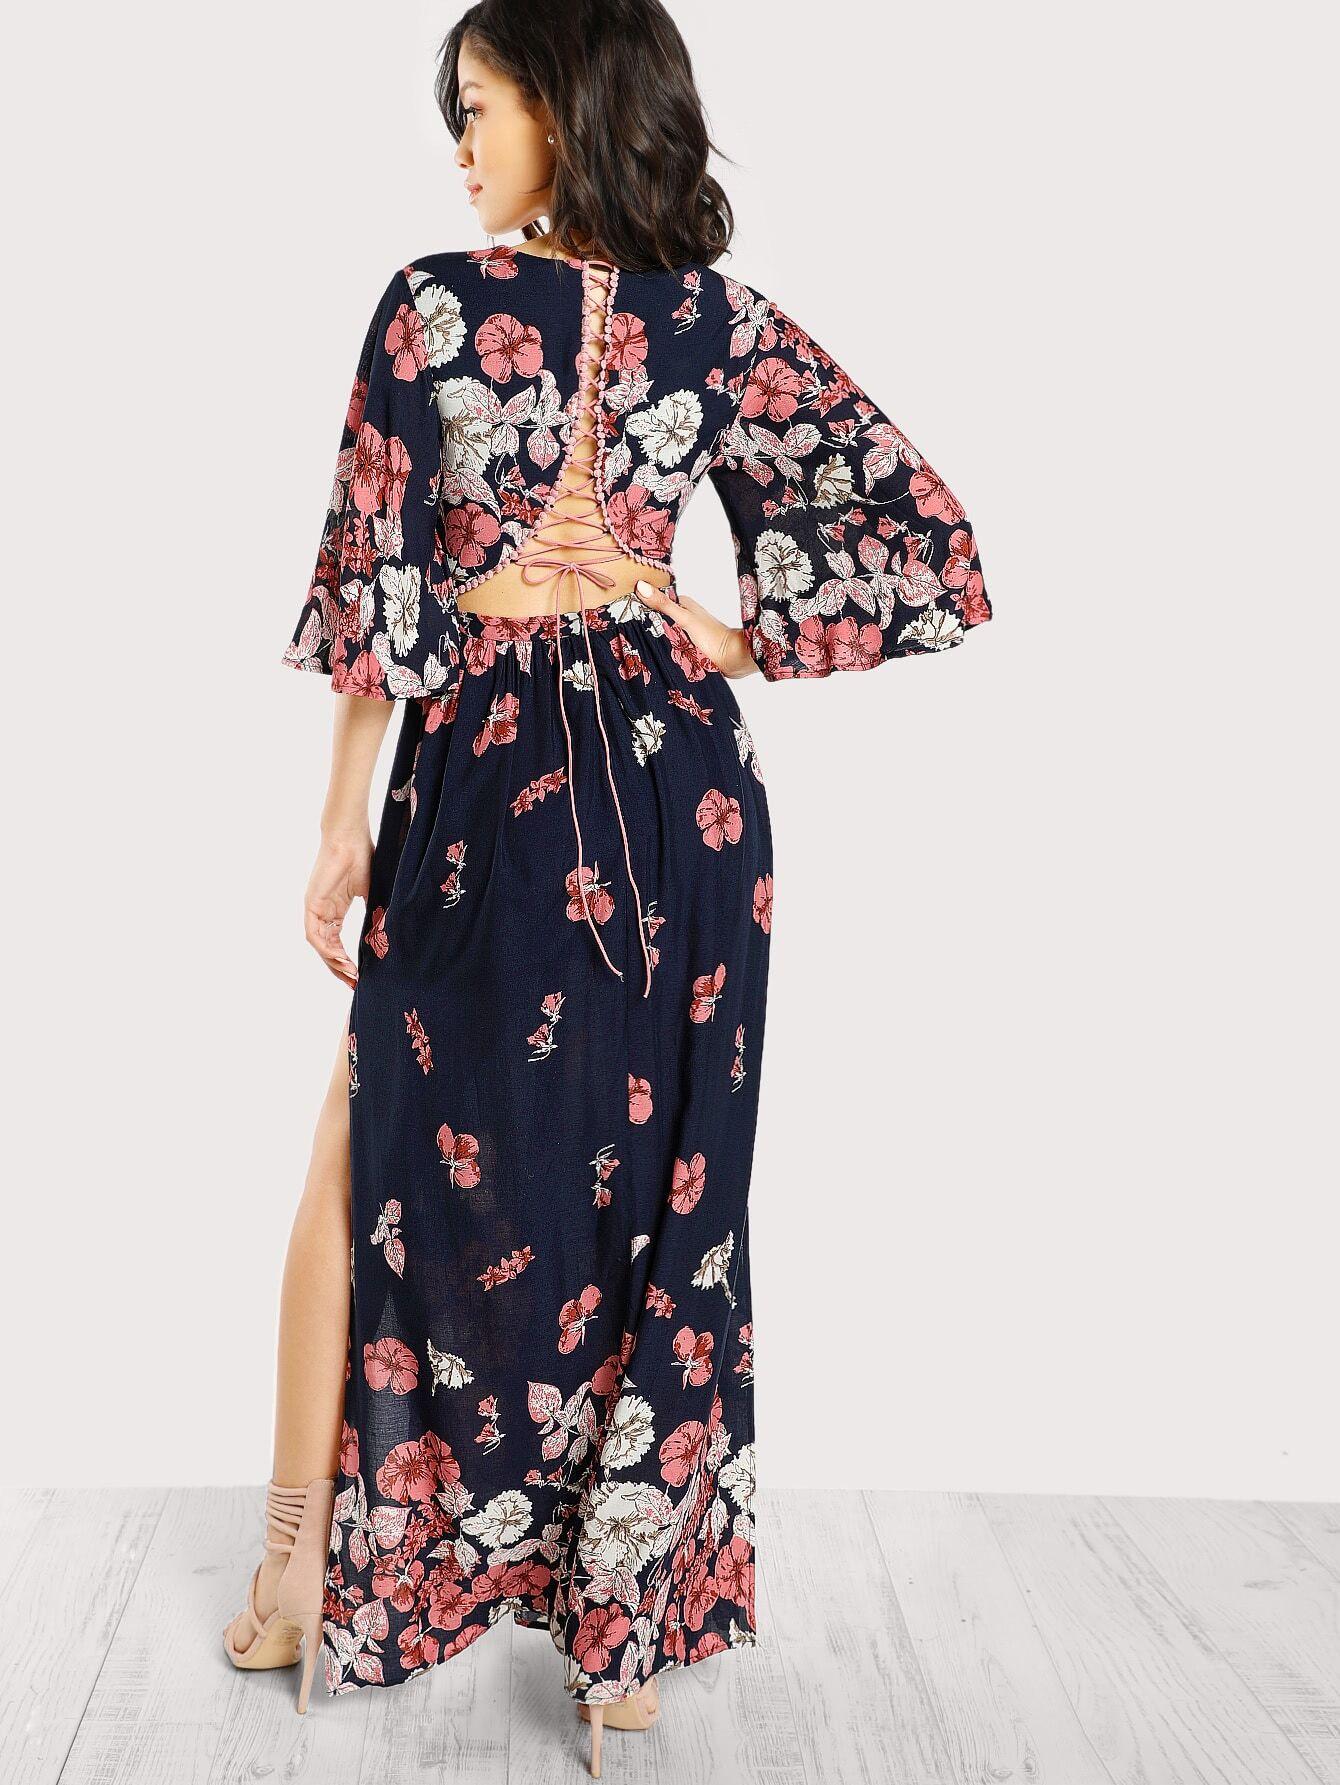 Plunge Neck Lace Up Back Slit Dress пуговицы декоративные dress it up цветное колесо 50 шт 7702398